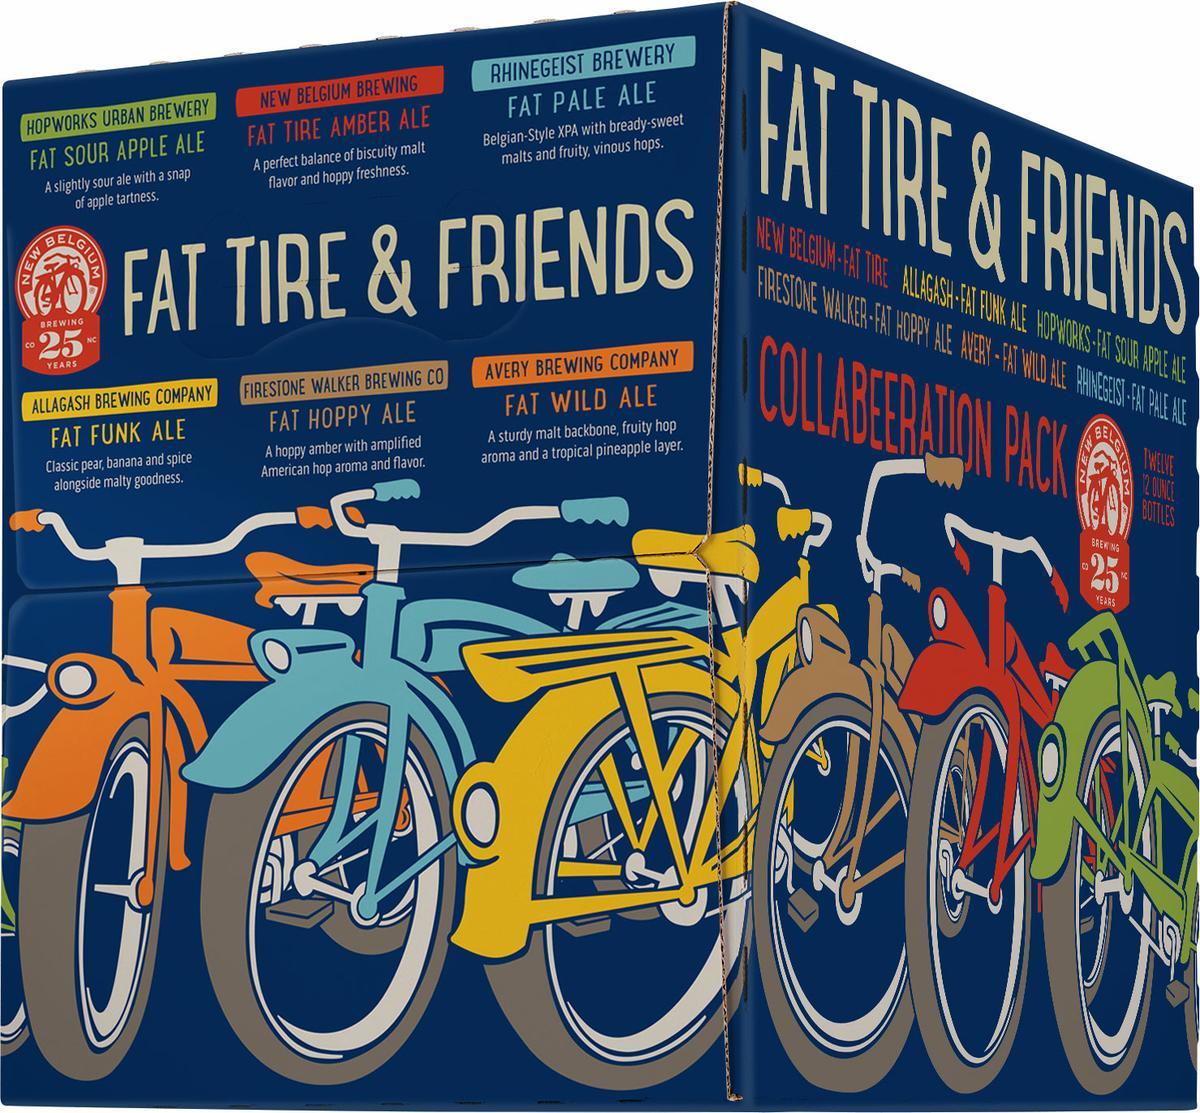 Freshpints Com New Belgium S Fat Tire Friends Collabeeration Pack